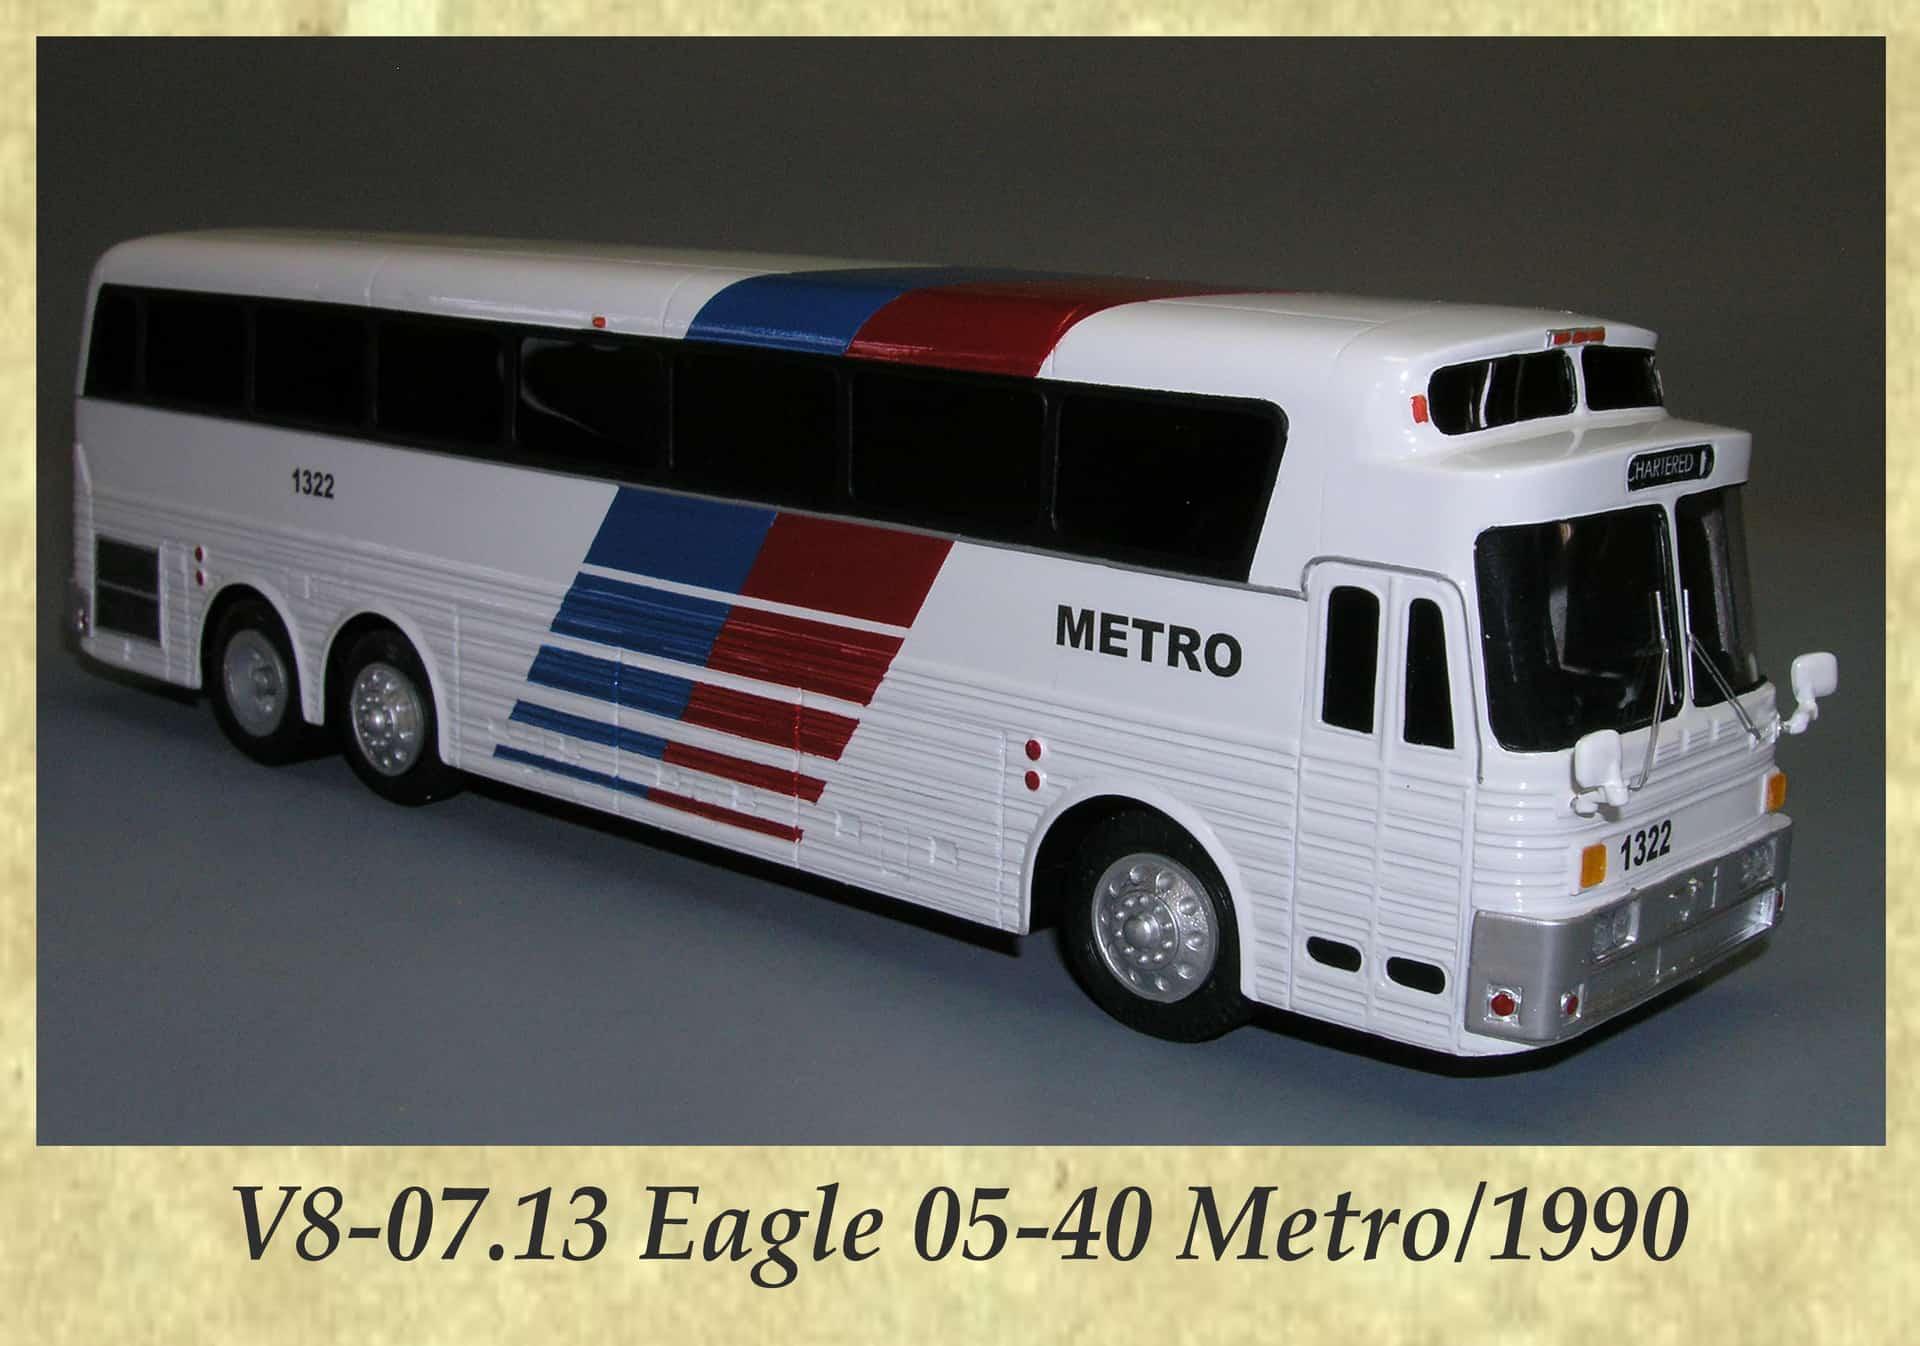 V8-07.13 Eagle 05-40 Metro 1990